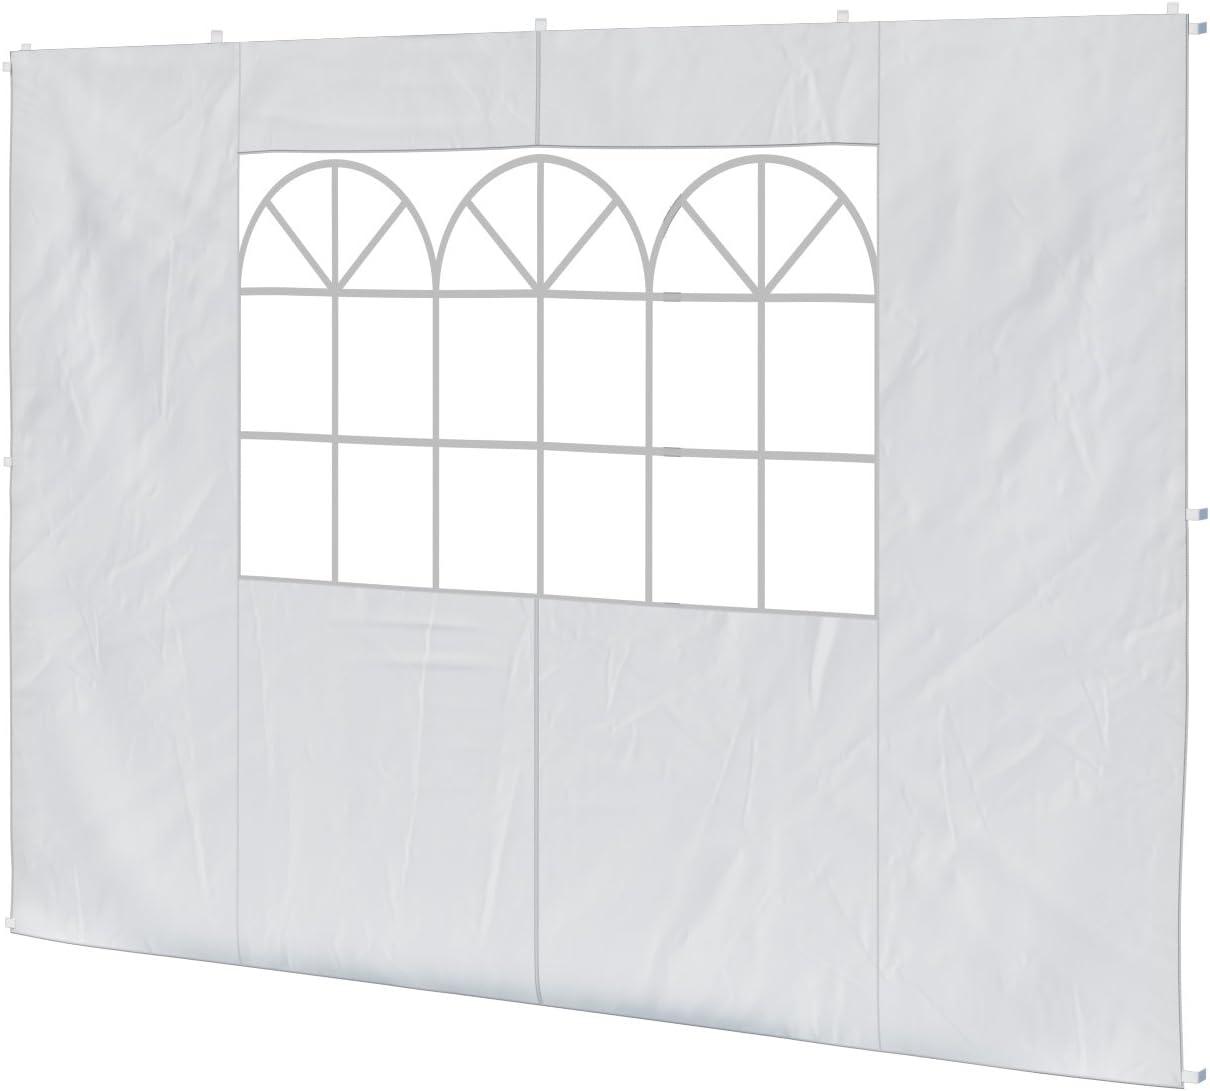 Colore: Bianco Panna Tenda Esagonale con 6 pareti Laterali SOULONG Gazebo Esagonale Pop-up Laterale 3,6 x 3,1 m